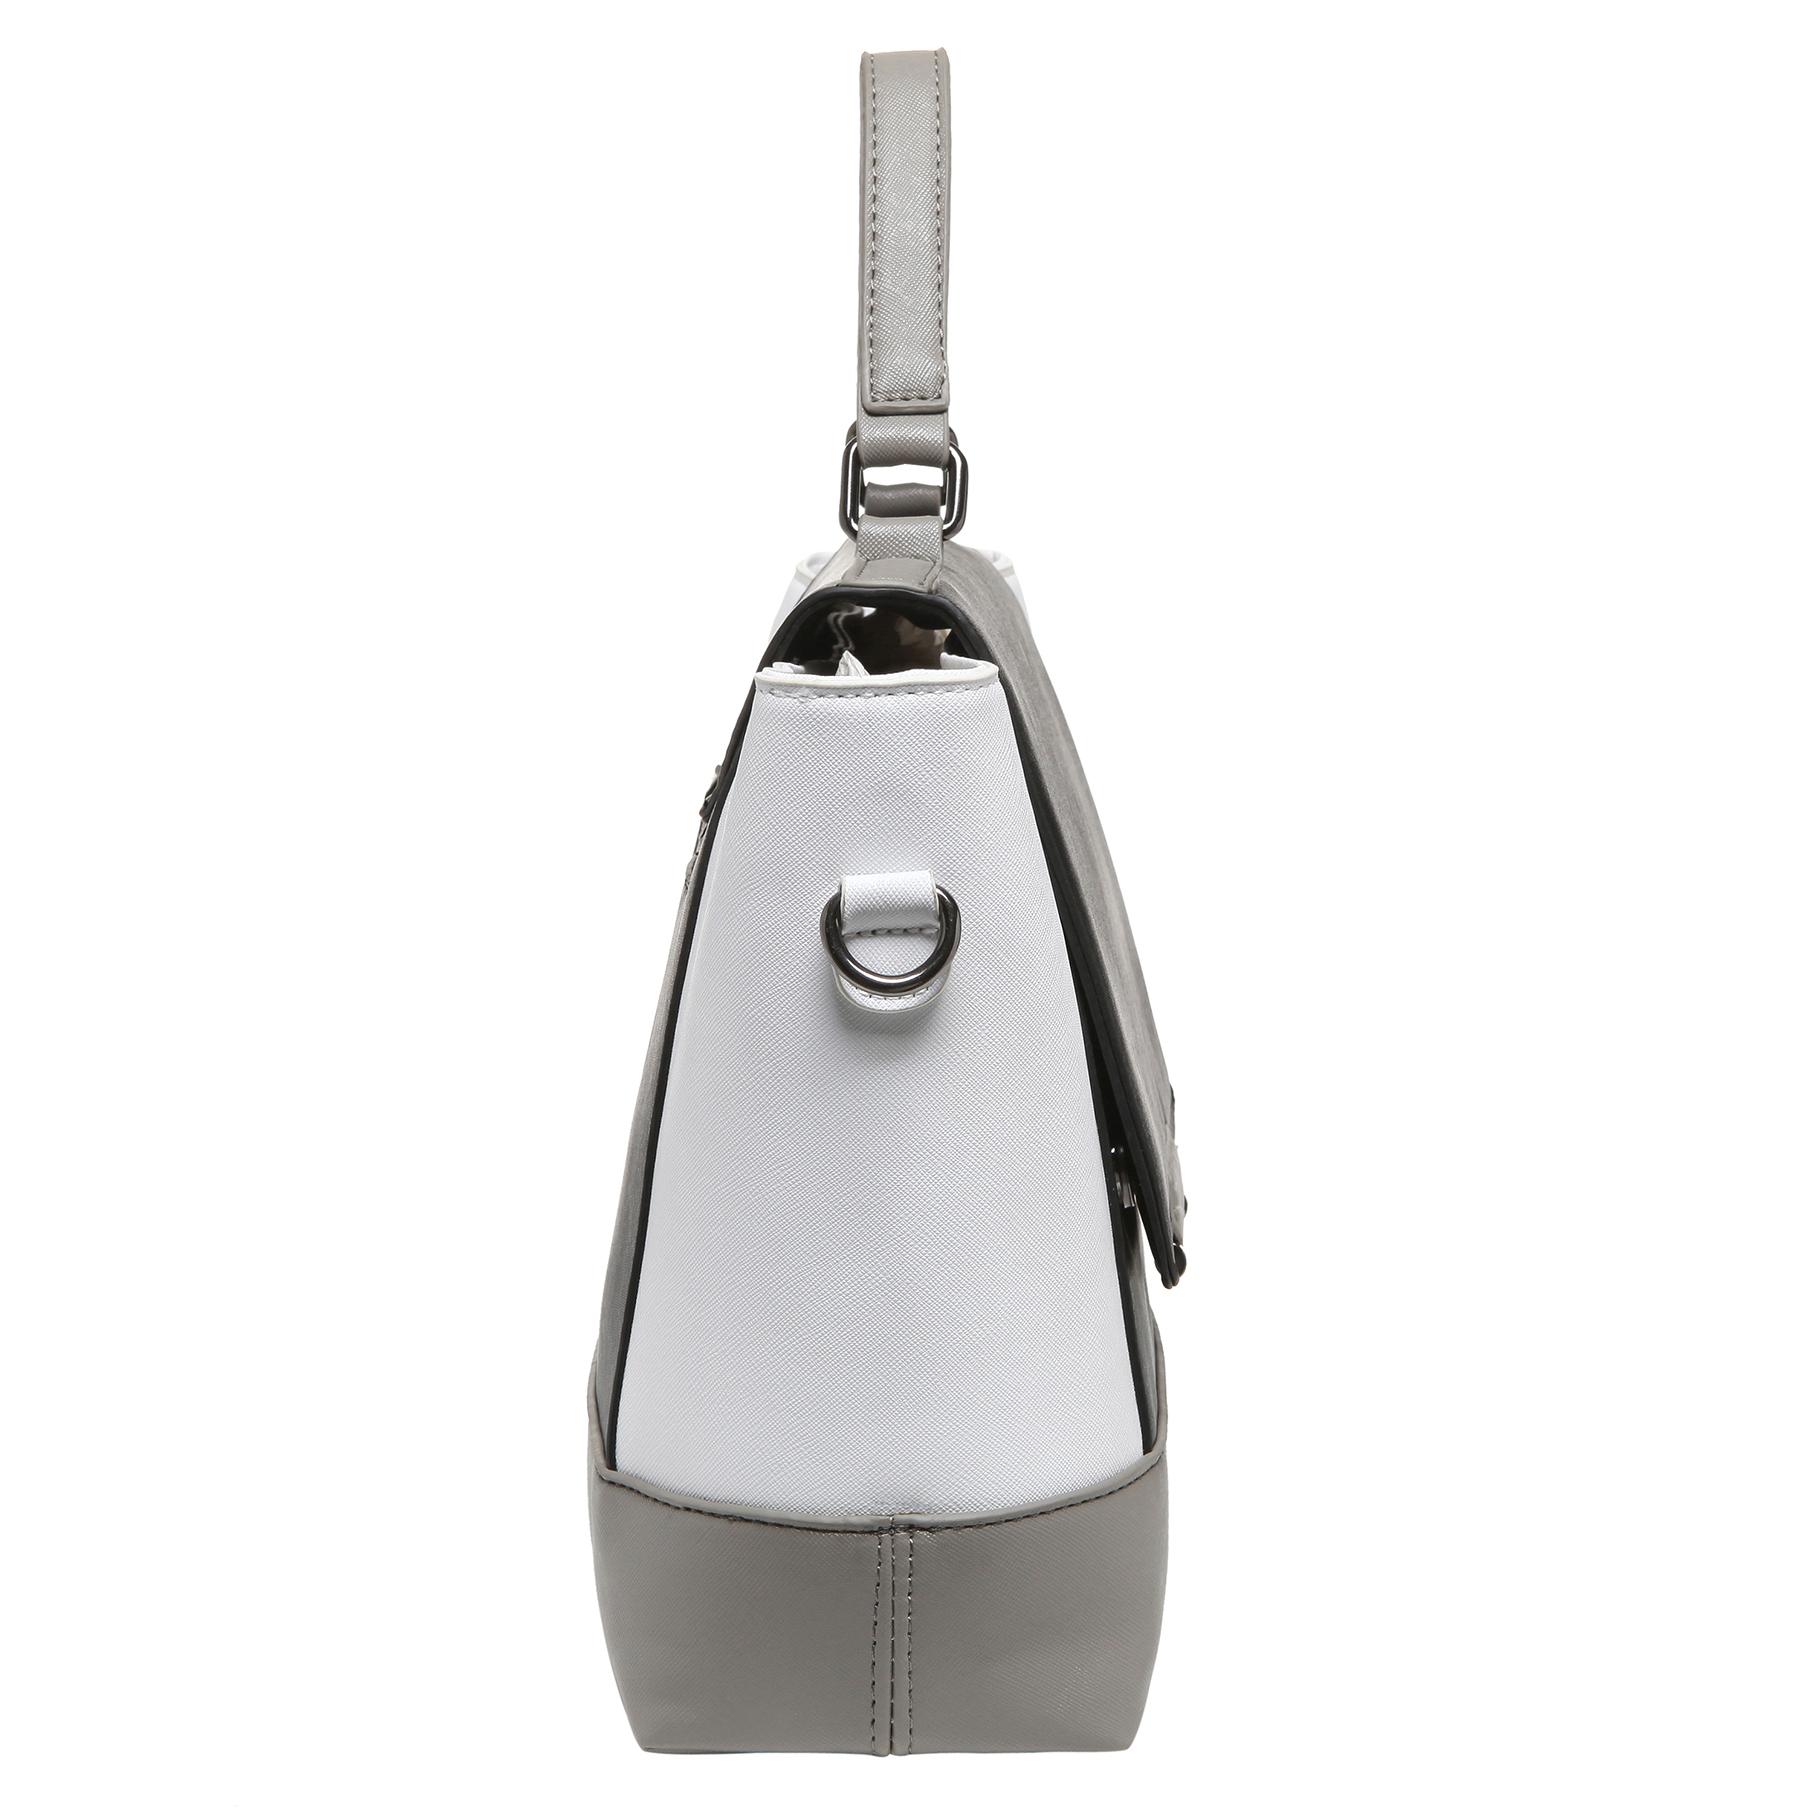 mg-collection-meryl-top-handle-tote-handbag-tb-h0651blk-4.jpg